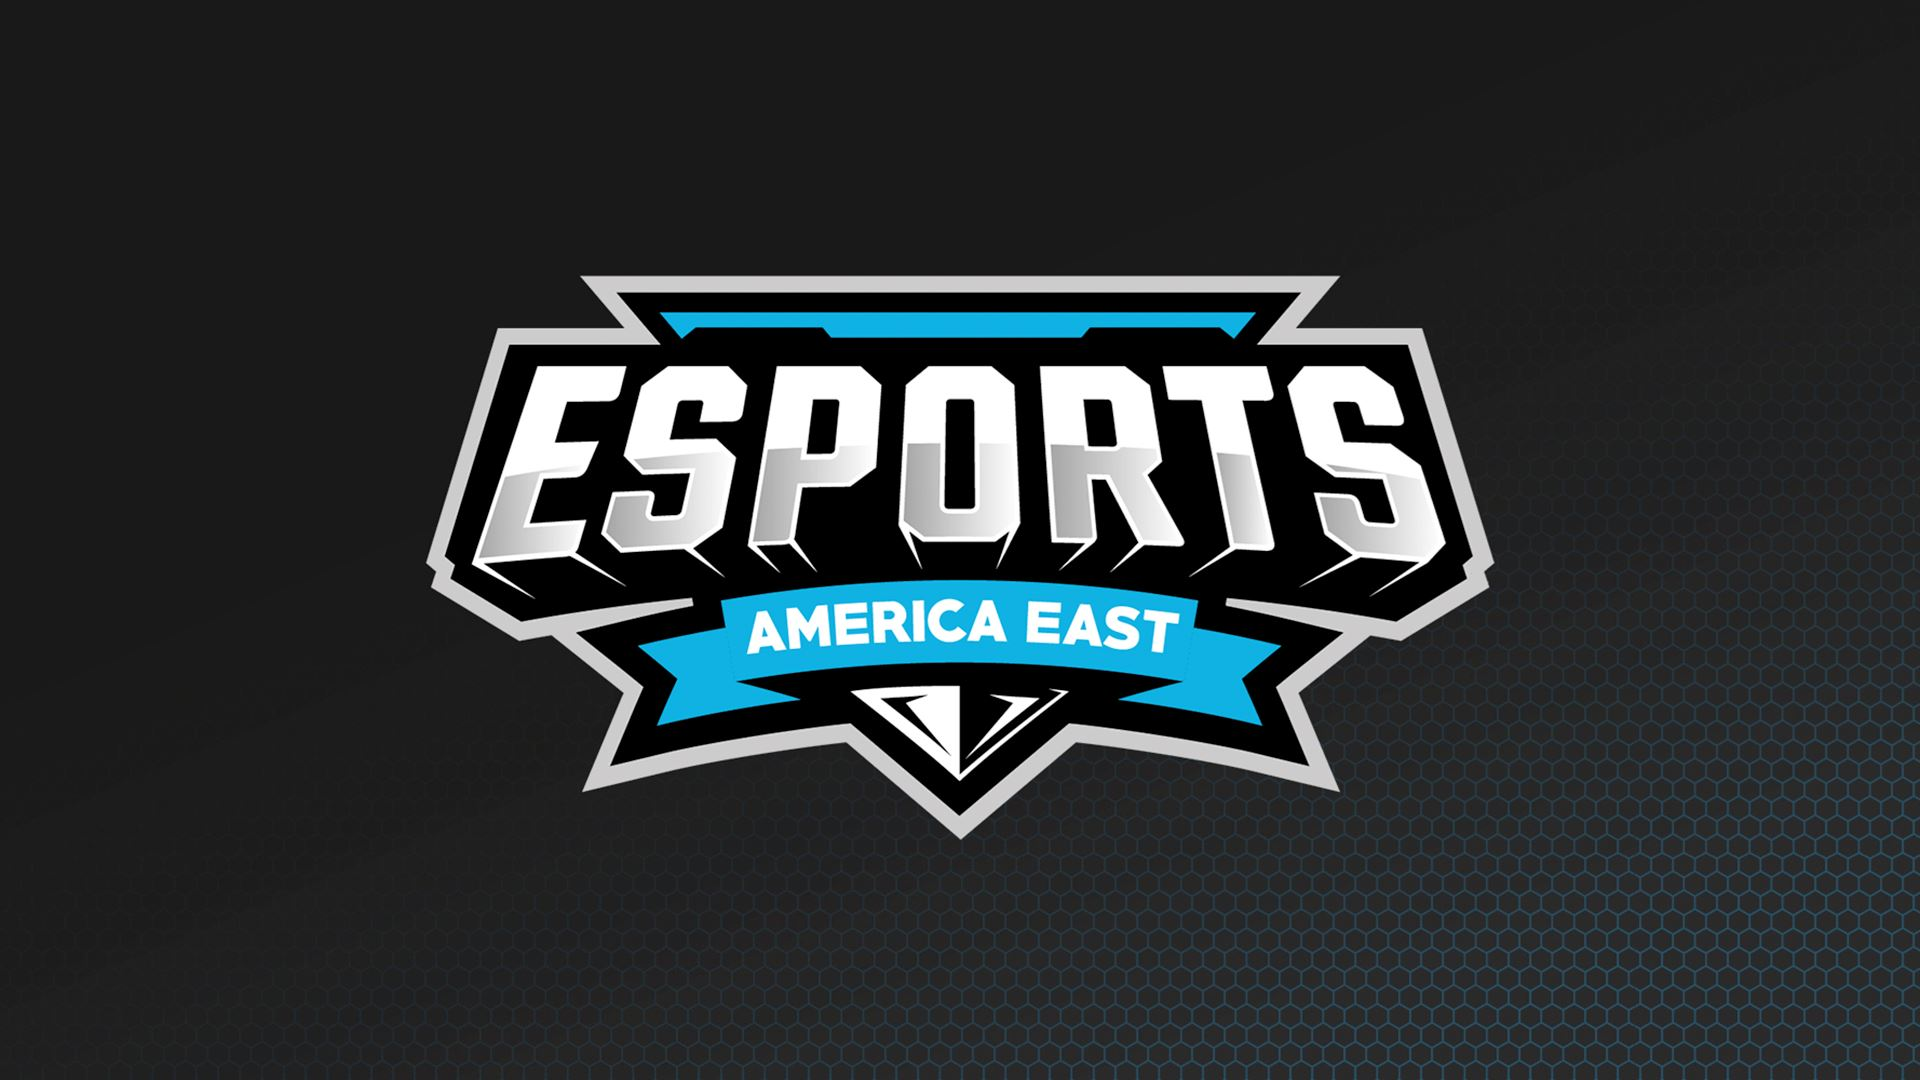 AmericaEastesports